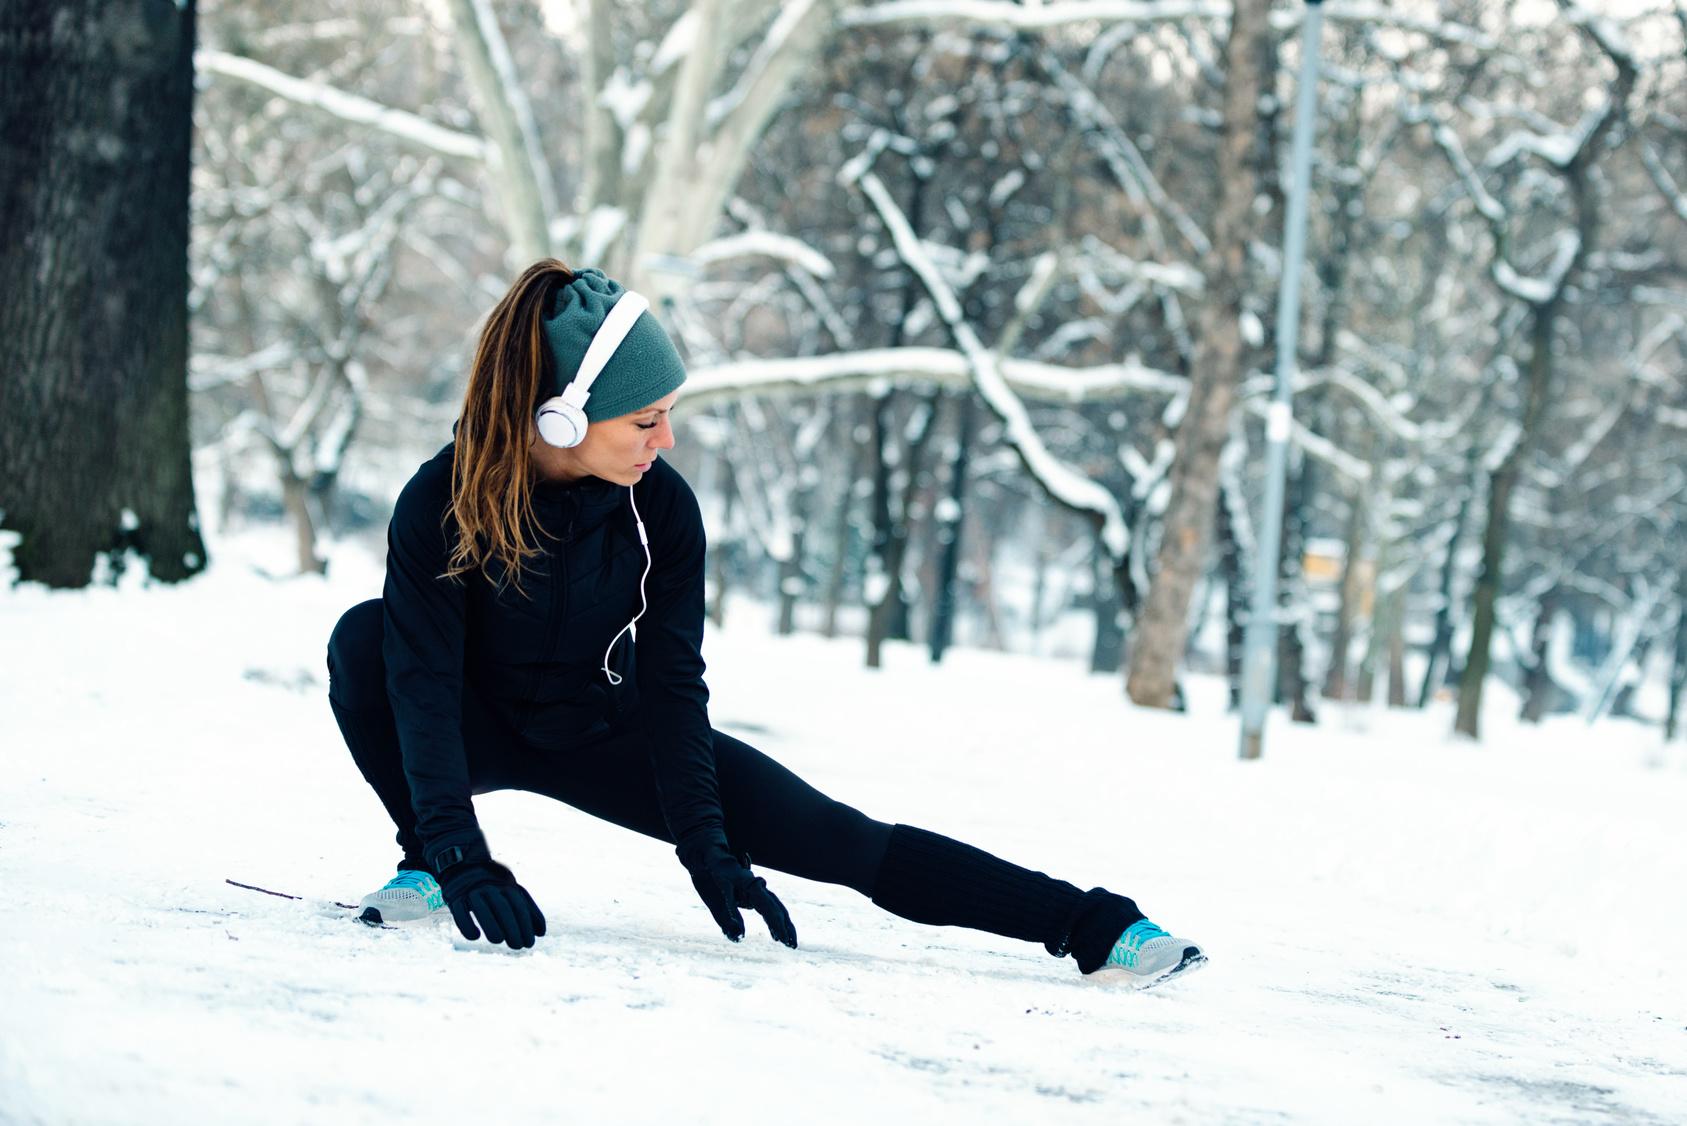 Exercising-healthy-in-winter.jpg